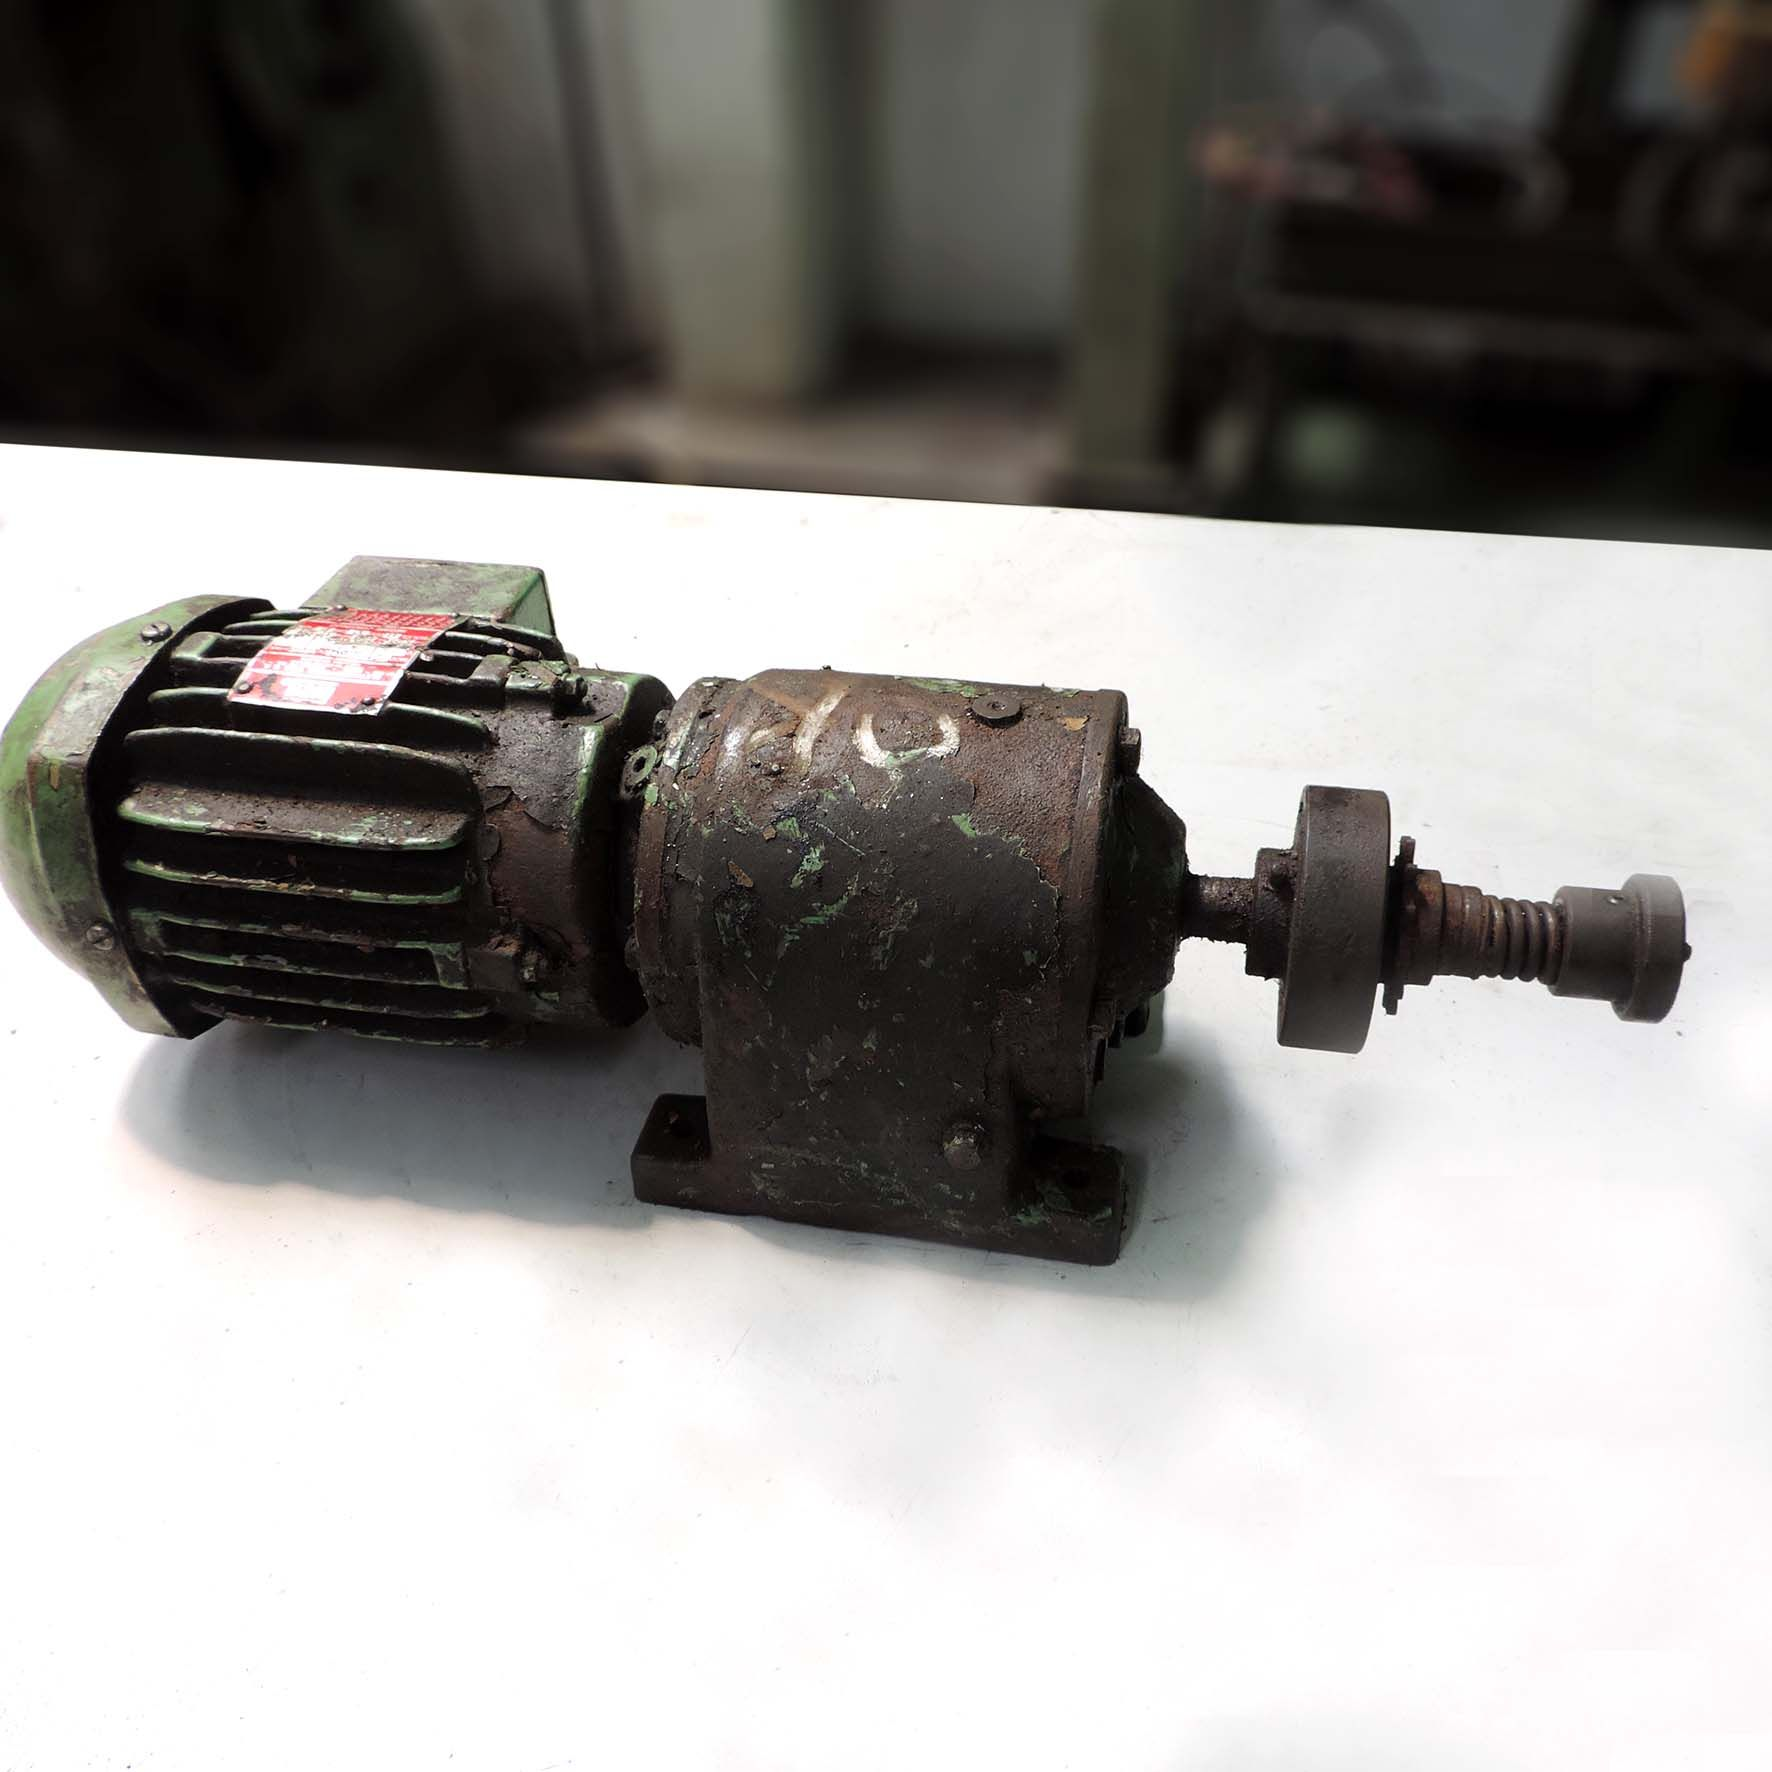 Motor Elétrico Trifásico Com Redutor 0,33 cv Marca Weg Nc16